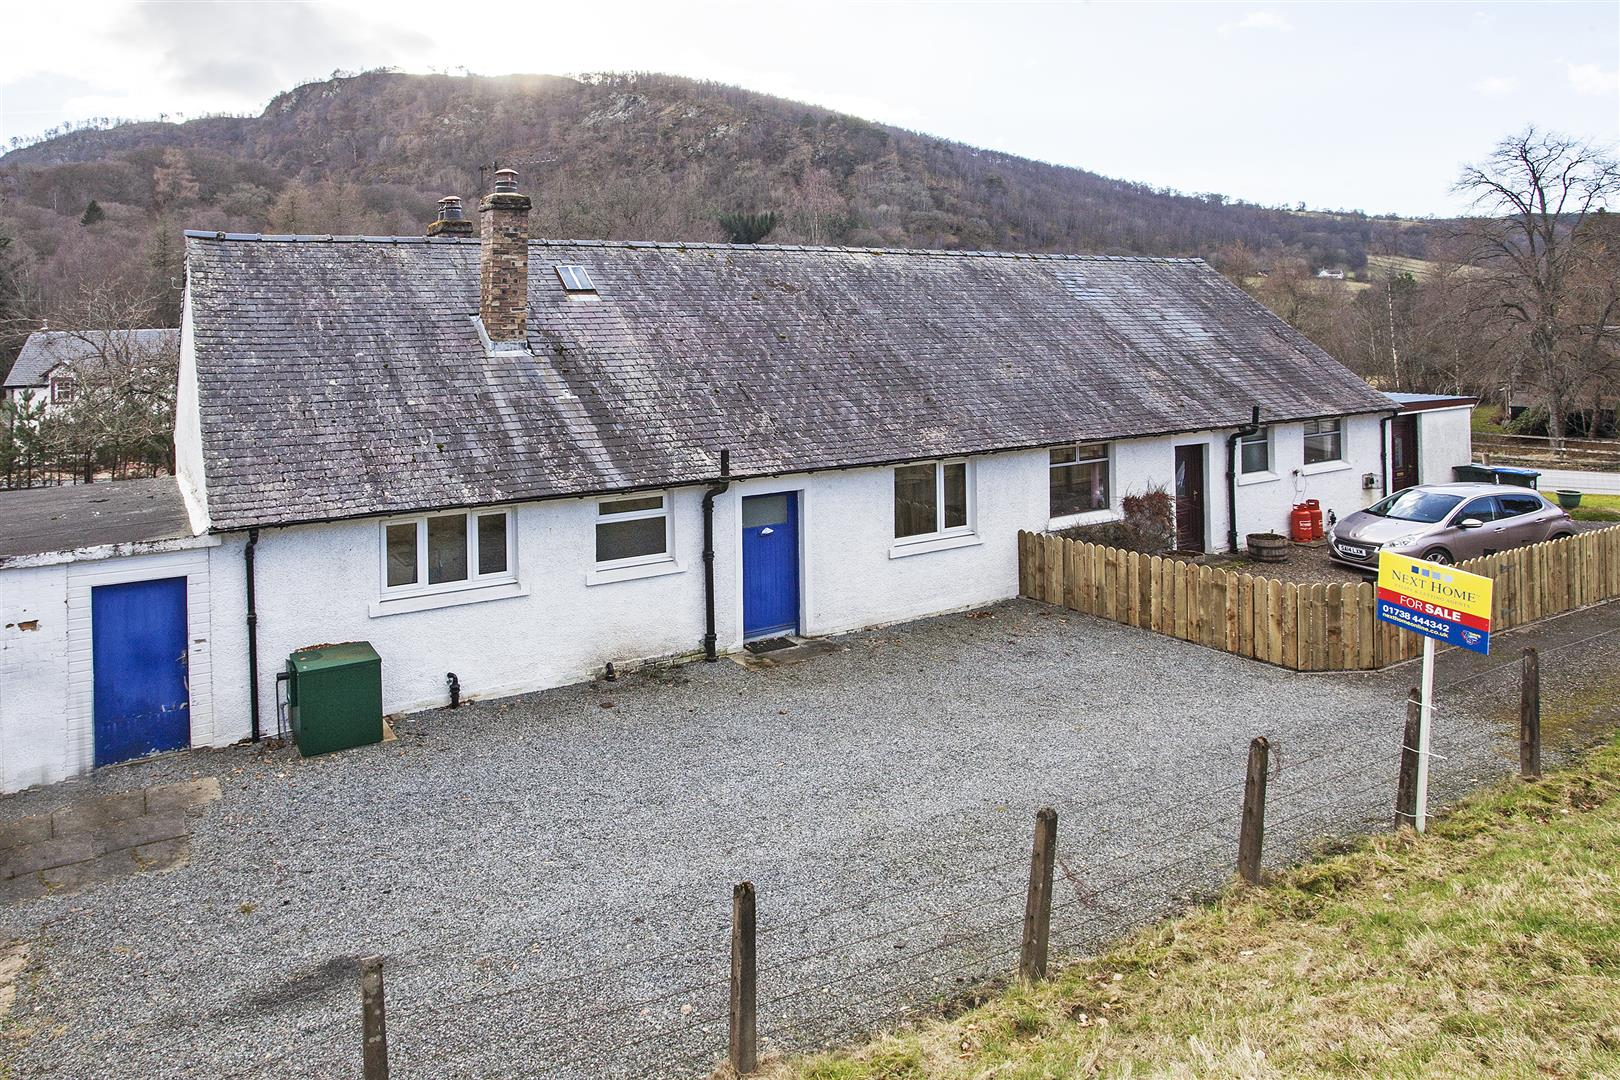 1 Killiecrankie Cottage, Killiecrankie, Pitlochry, Perthshire, PH16 5LG, UK